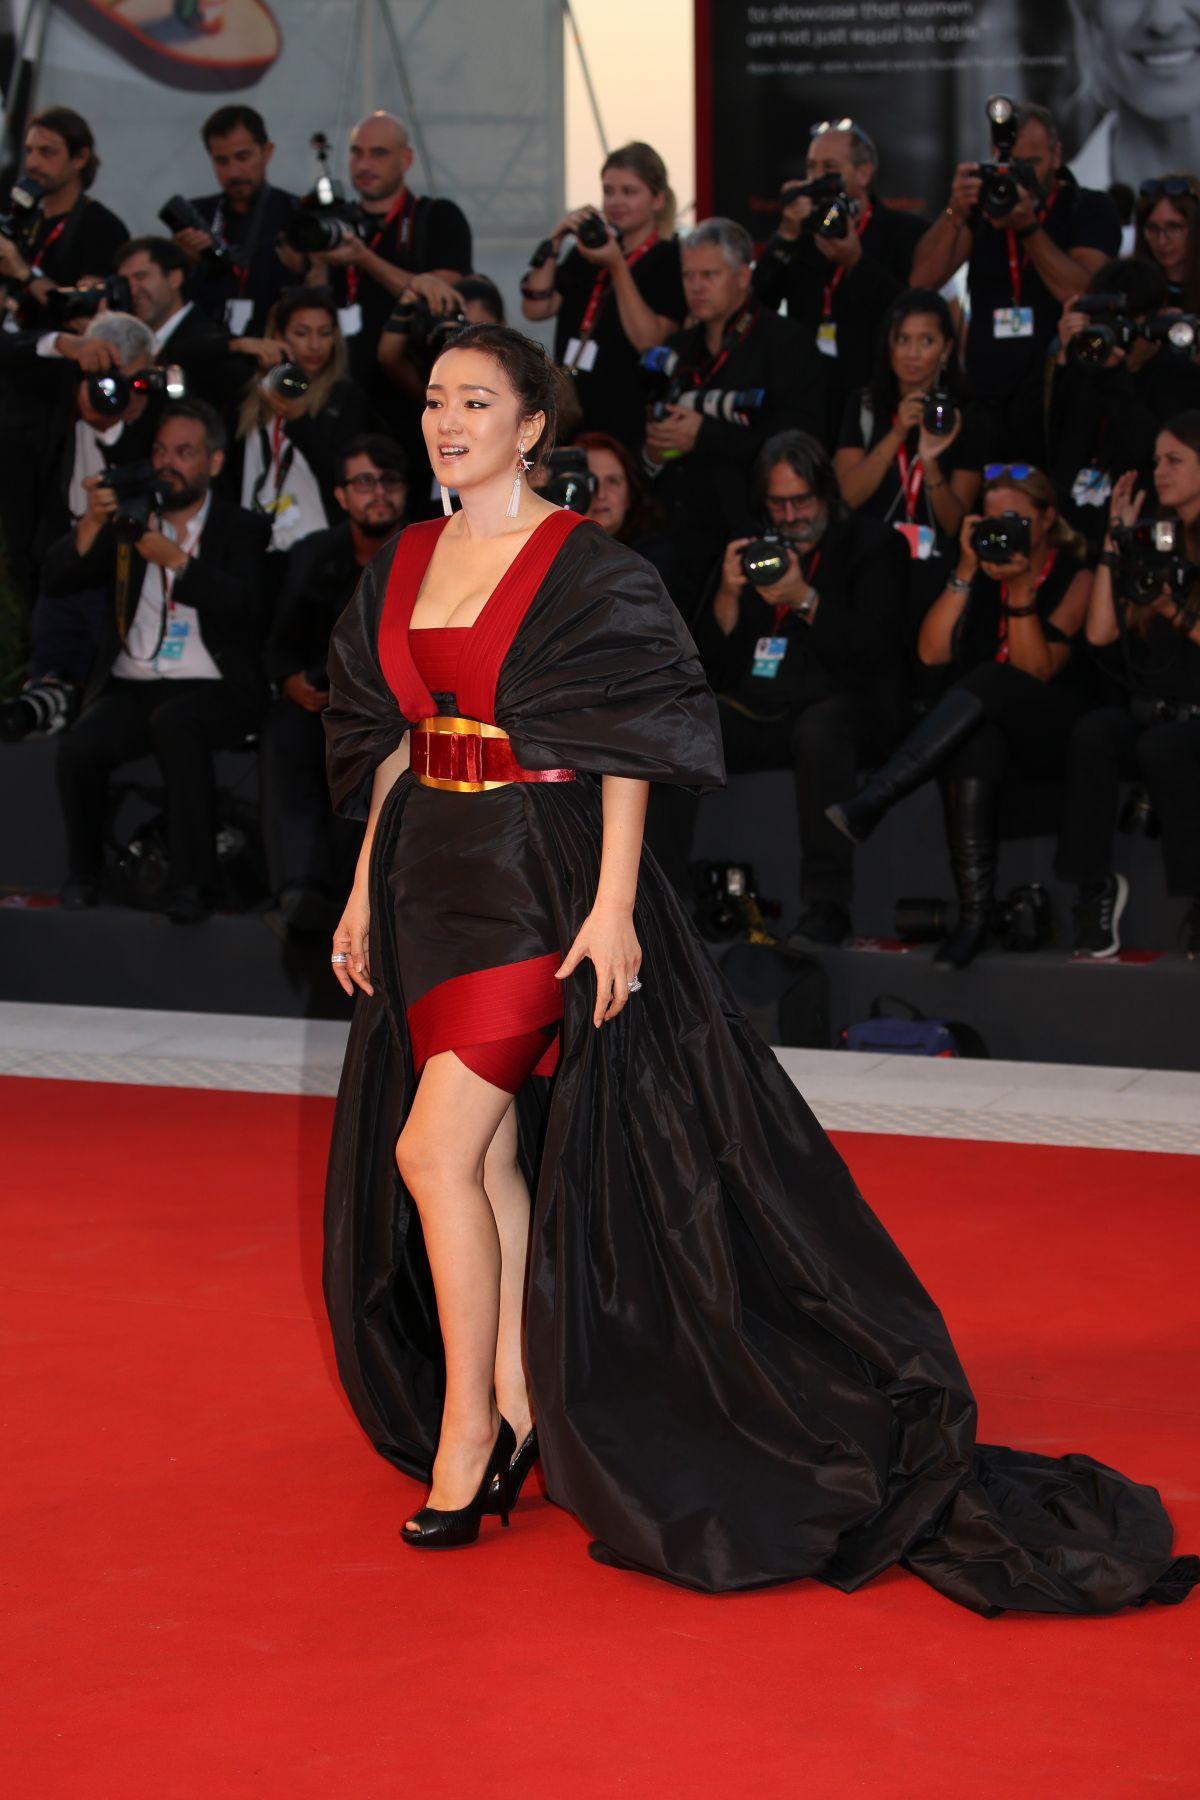 Gong Li At Saturday Fiction Premiere At 76th Venice Film